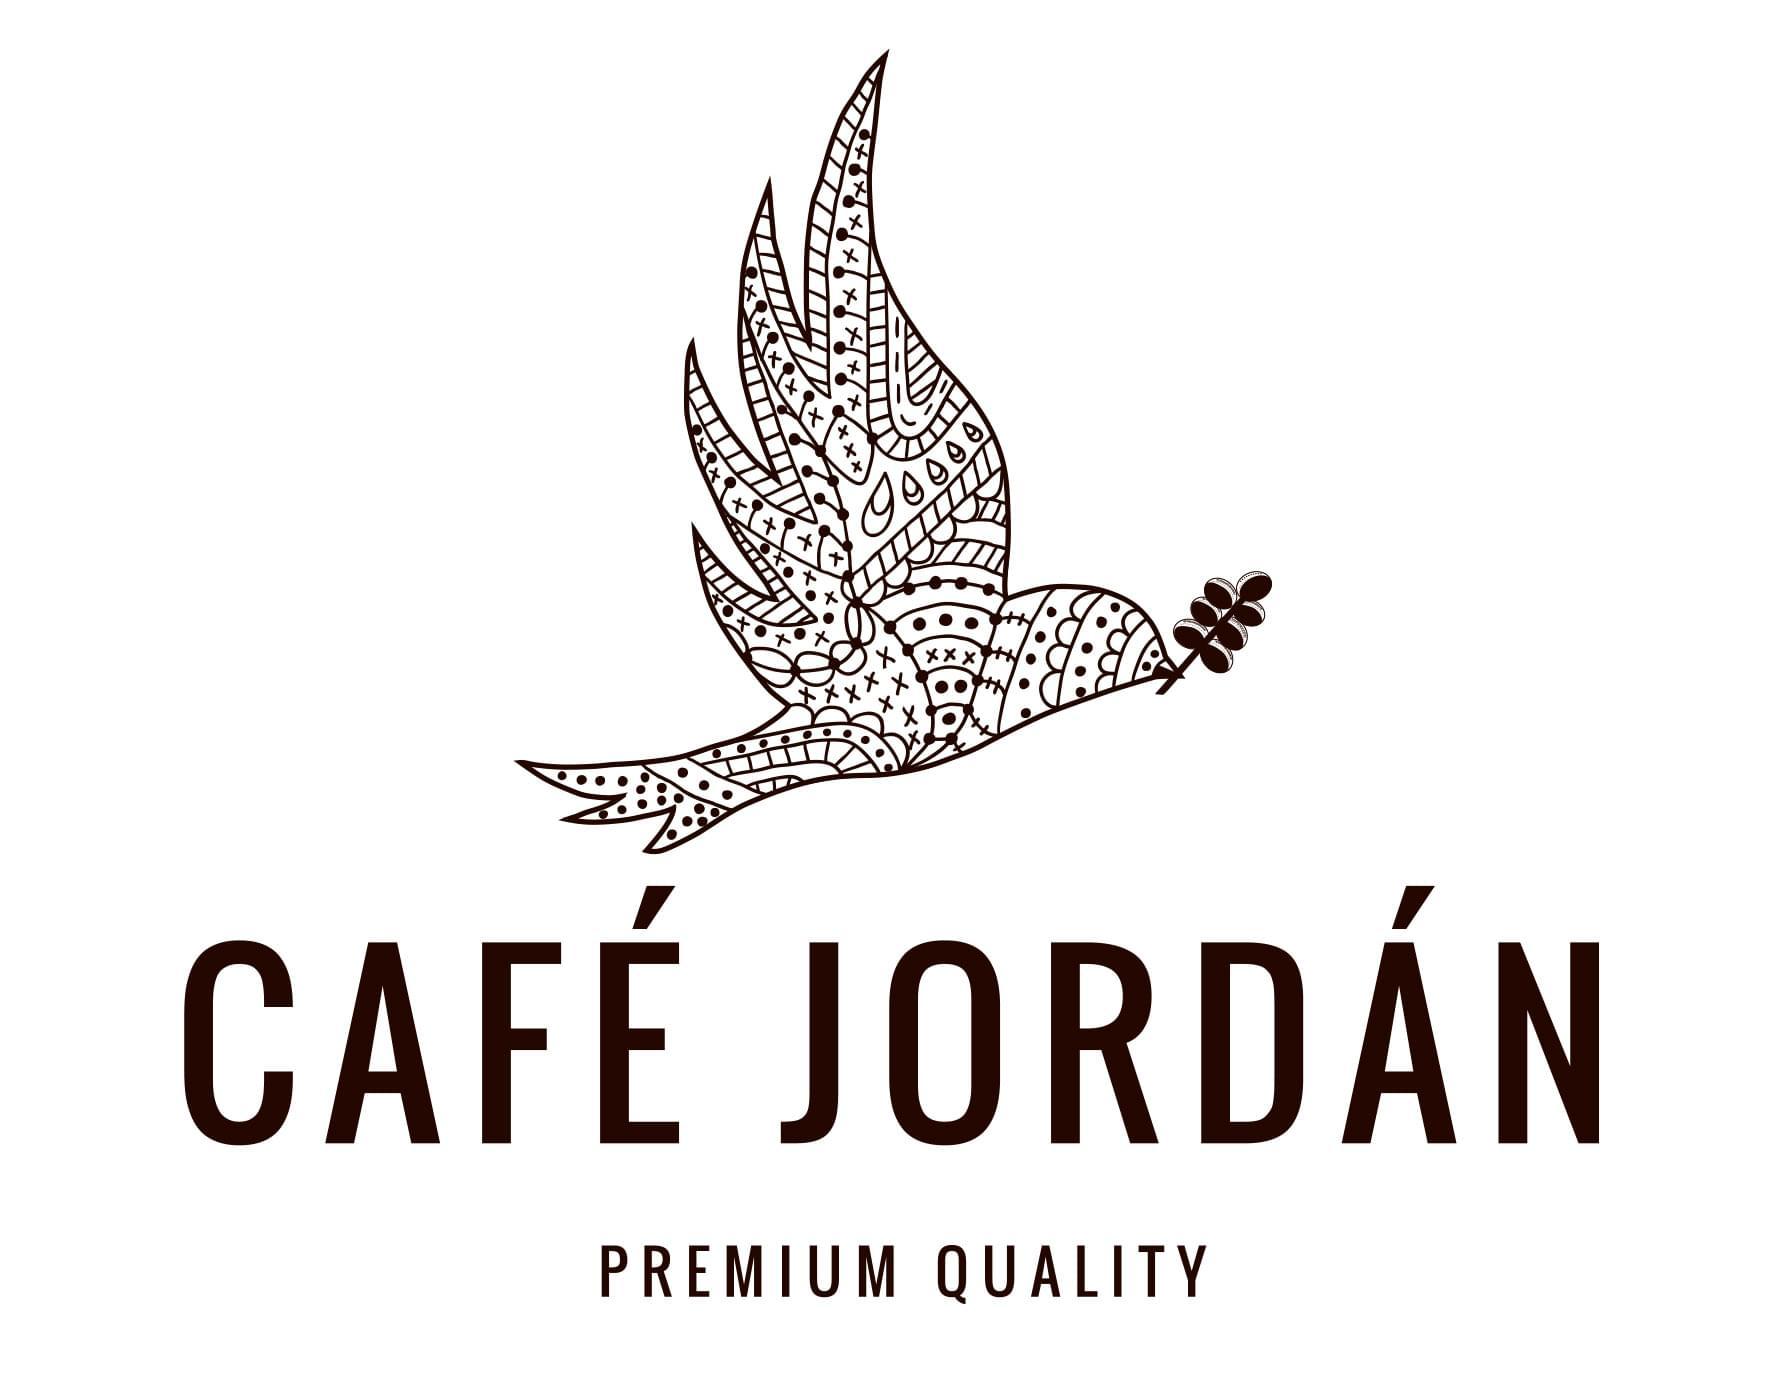 CAFÉ JORDÁN